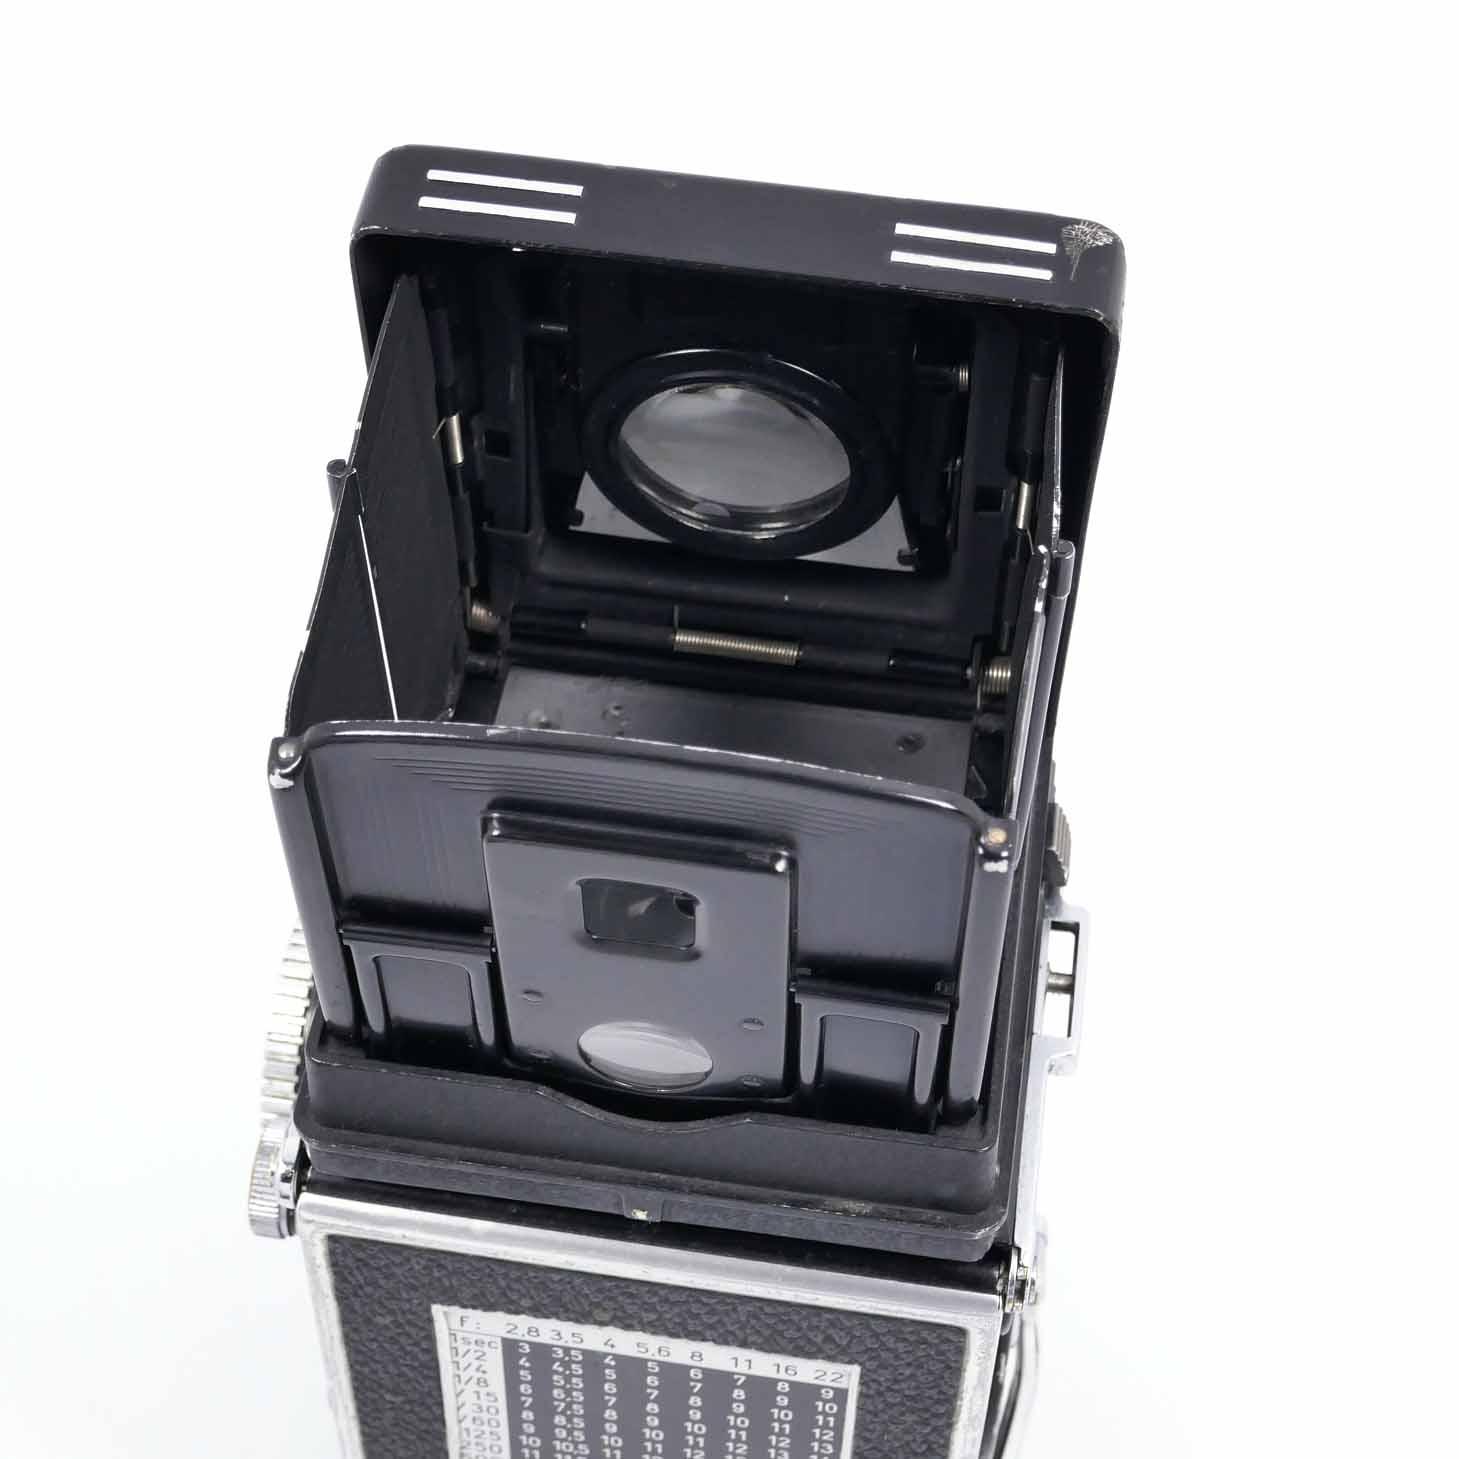 clean-cameras-Rolleiflex-2.8-F08